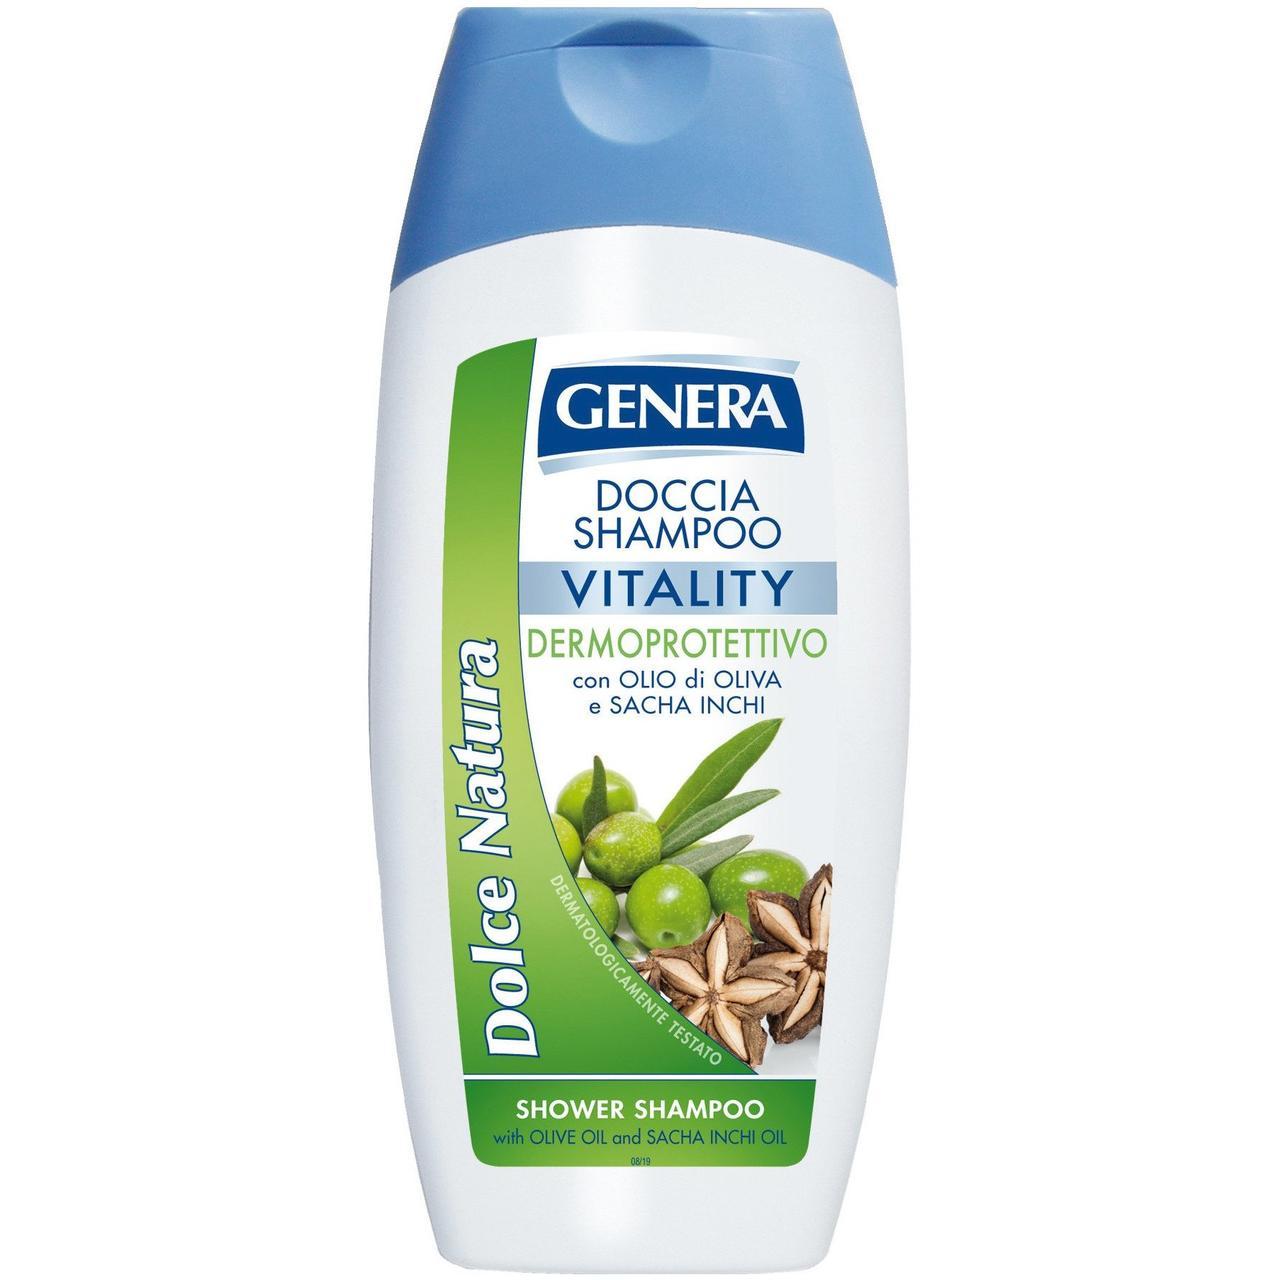 GENERA DOLCE NATURA Vitality Шампунь для волос Масло и Инка-инчи 300мл